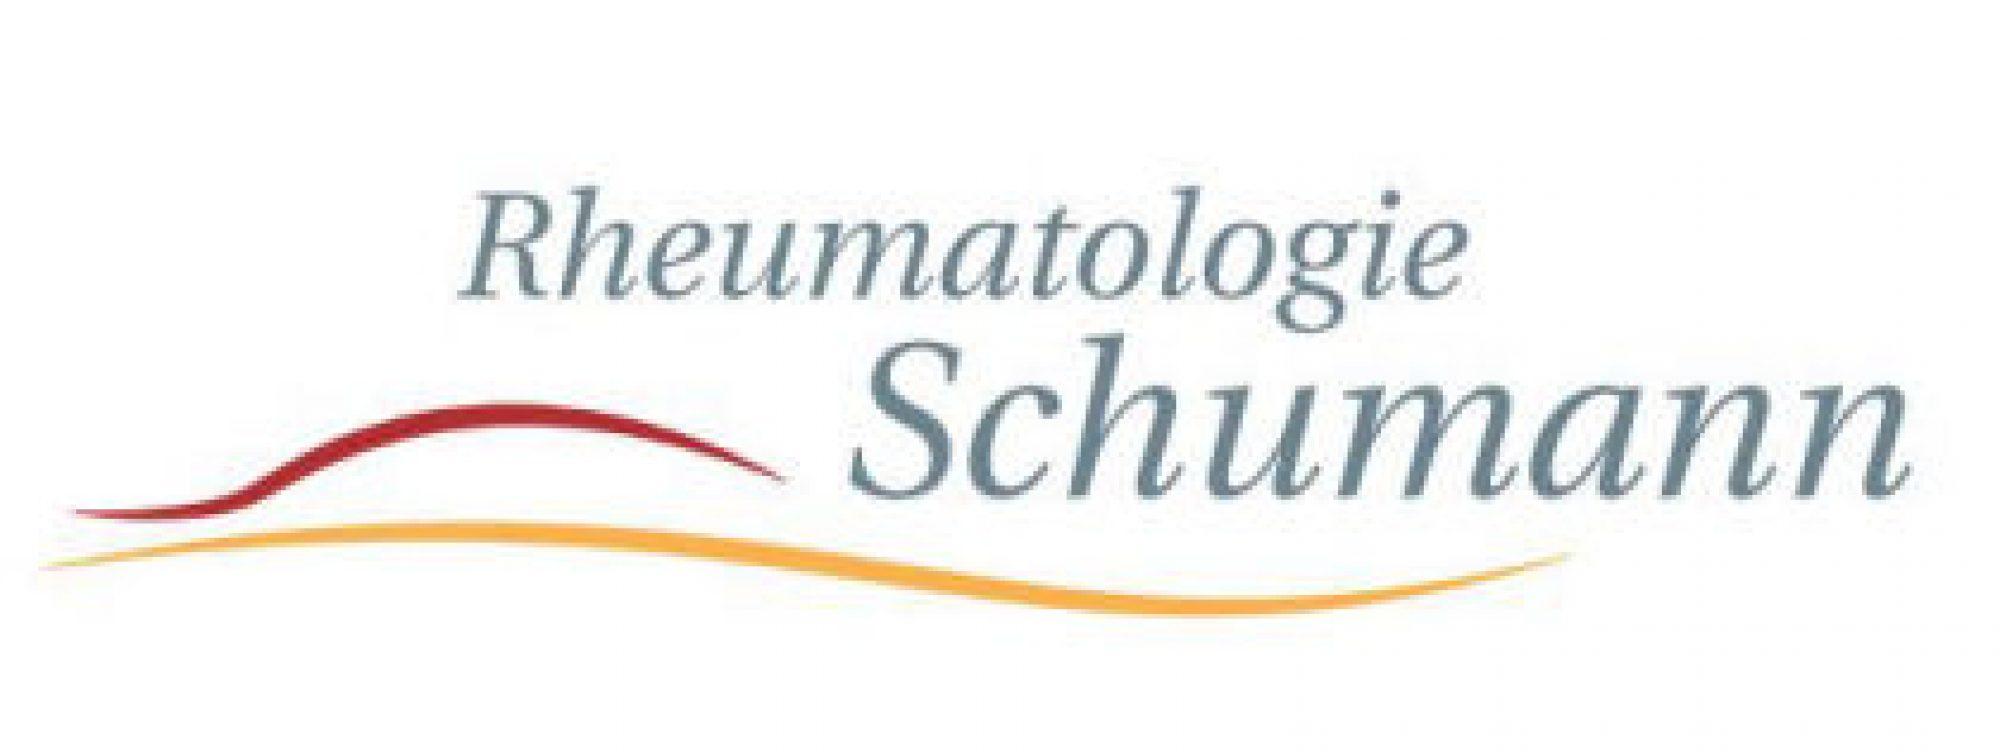 Rheumatologie Schumann